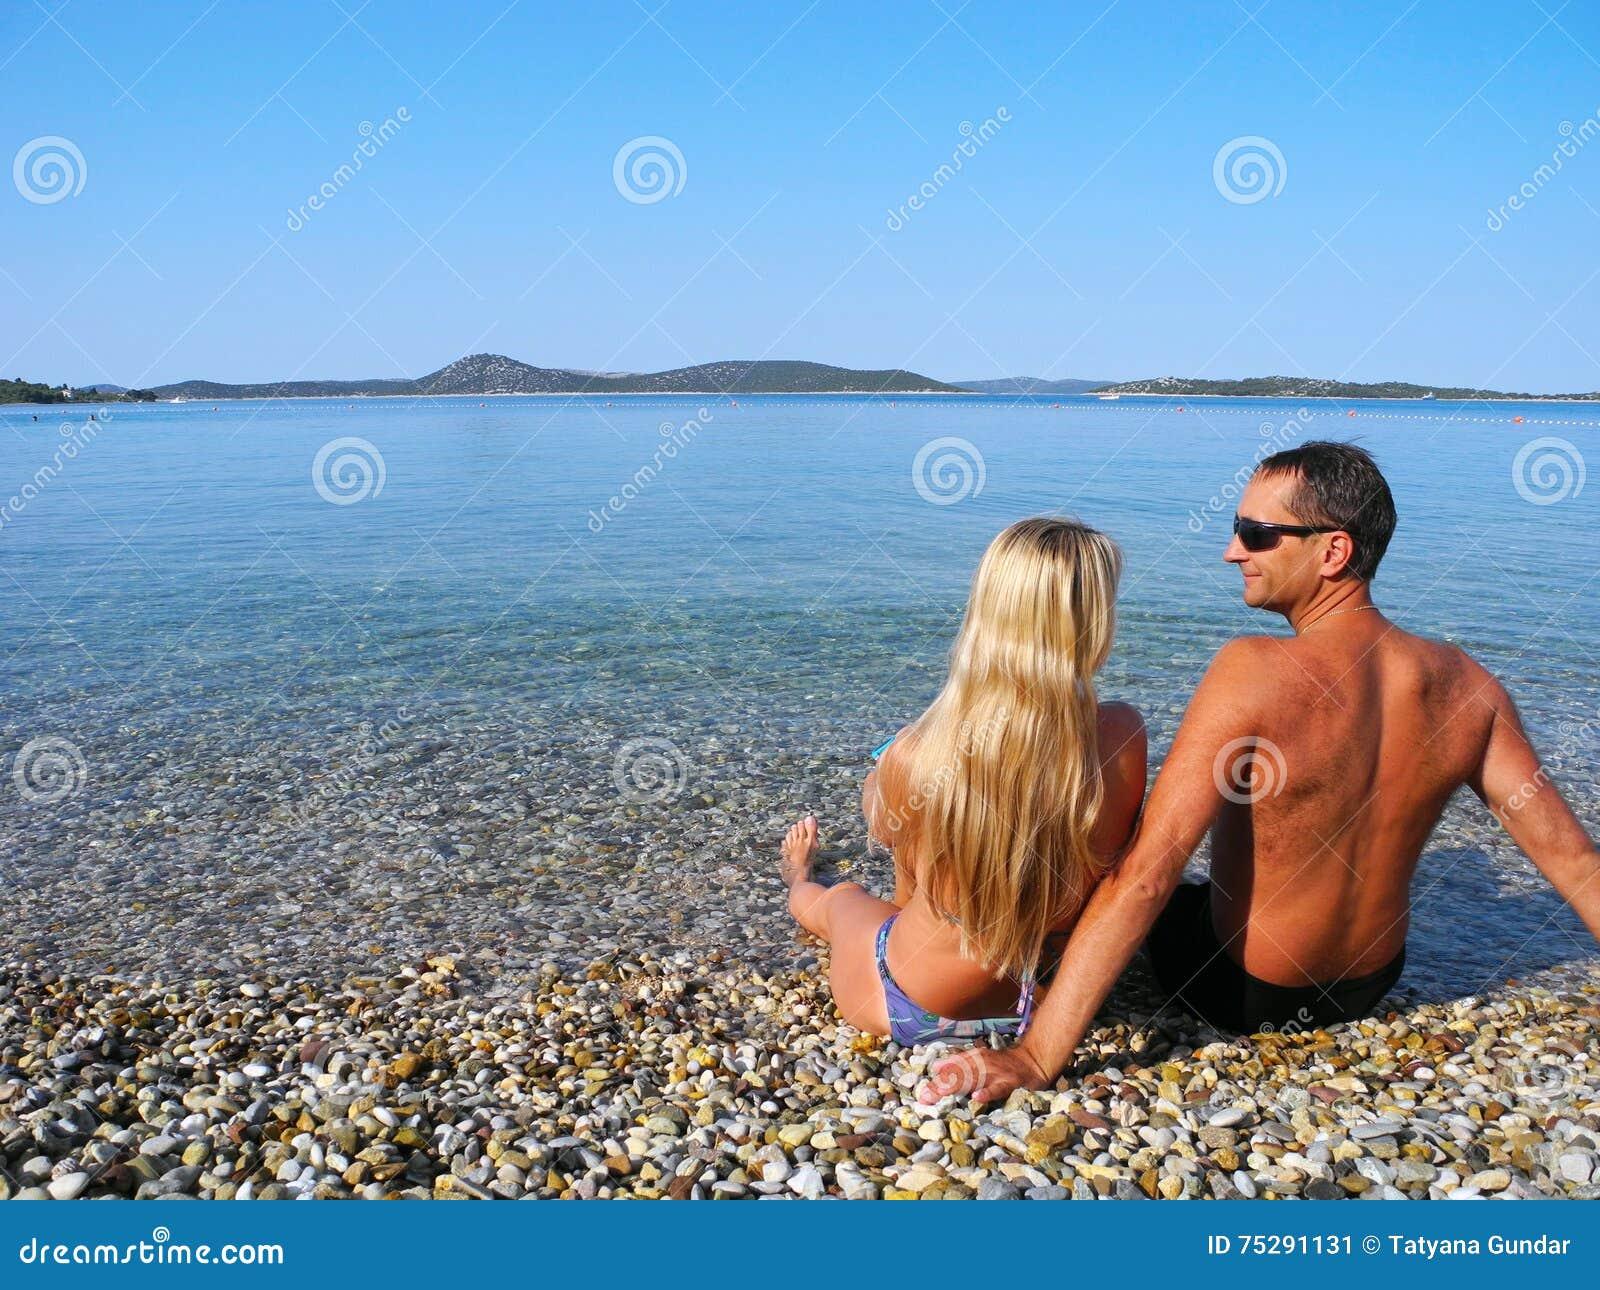 Romance by the sea.